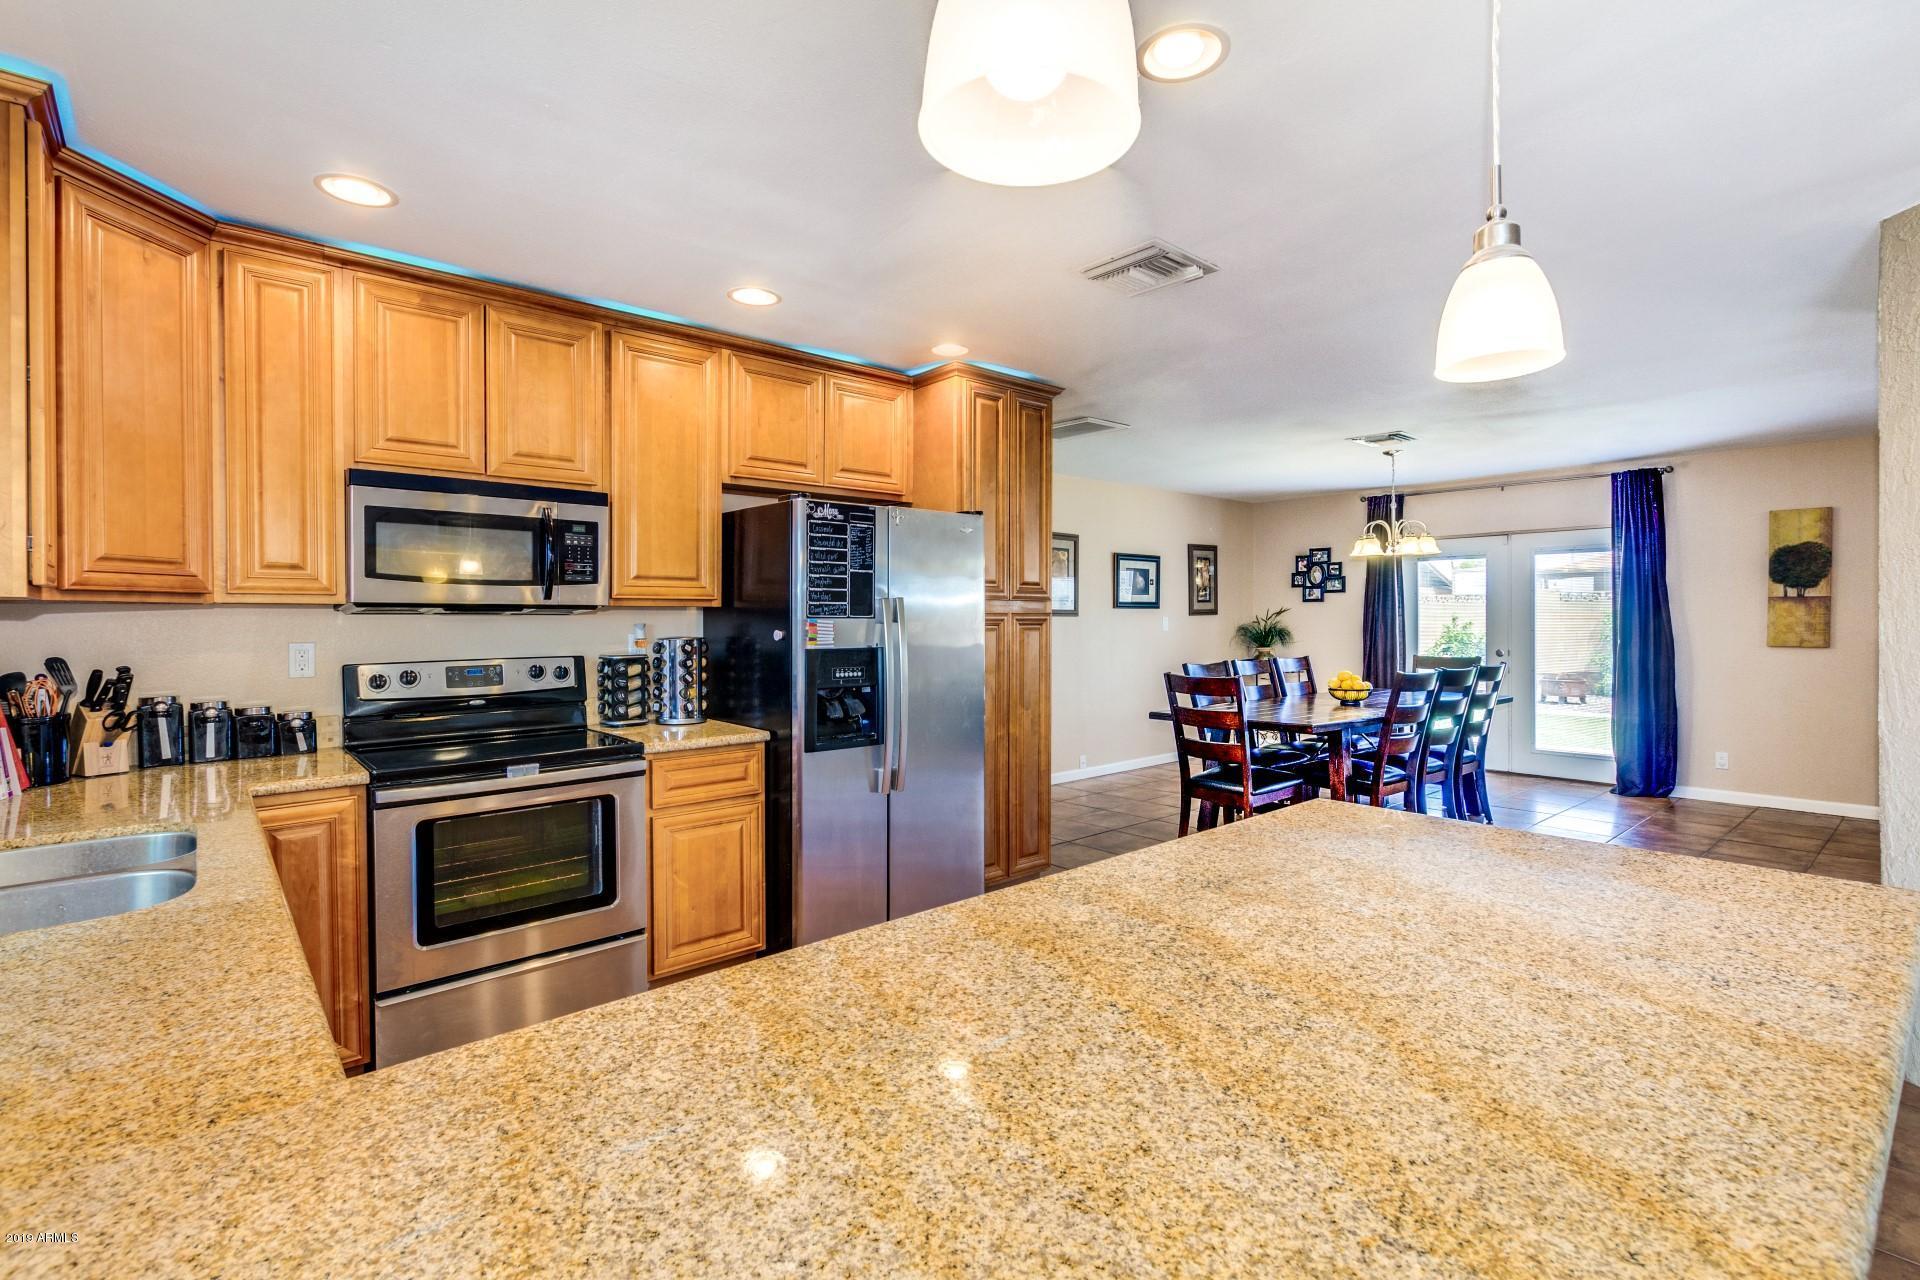 6144 E Hannibal Street, Mesa, AZ 85205-4511 $329,900 www